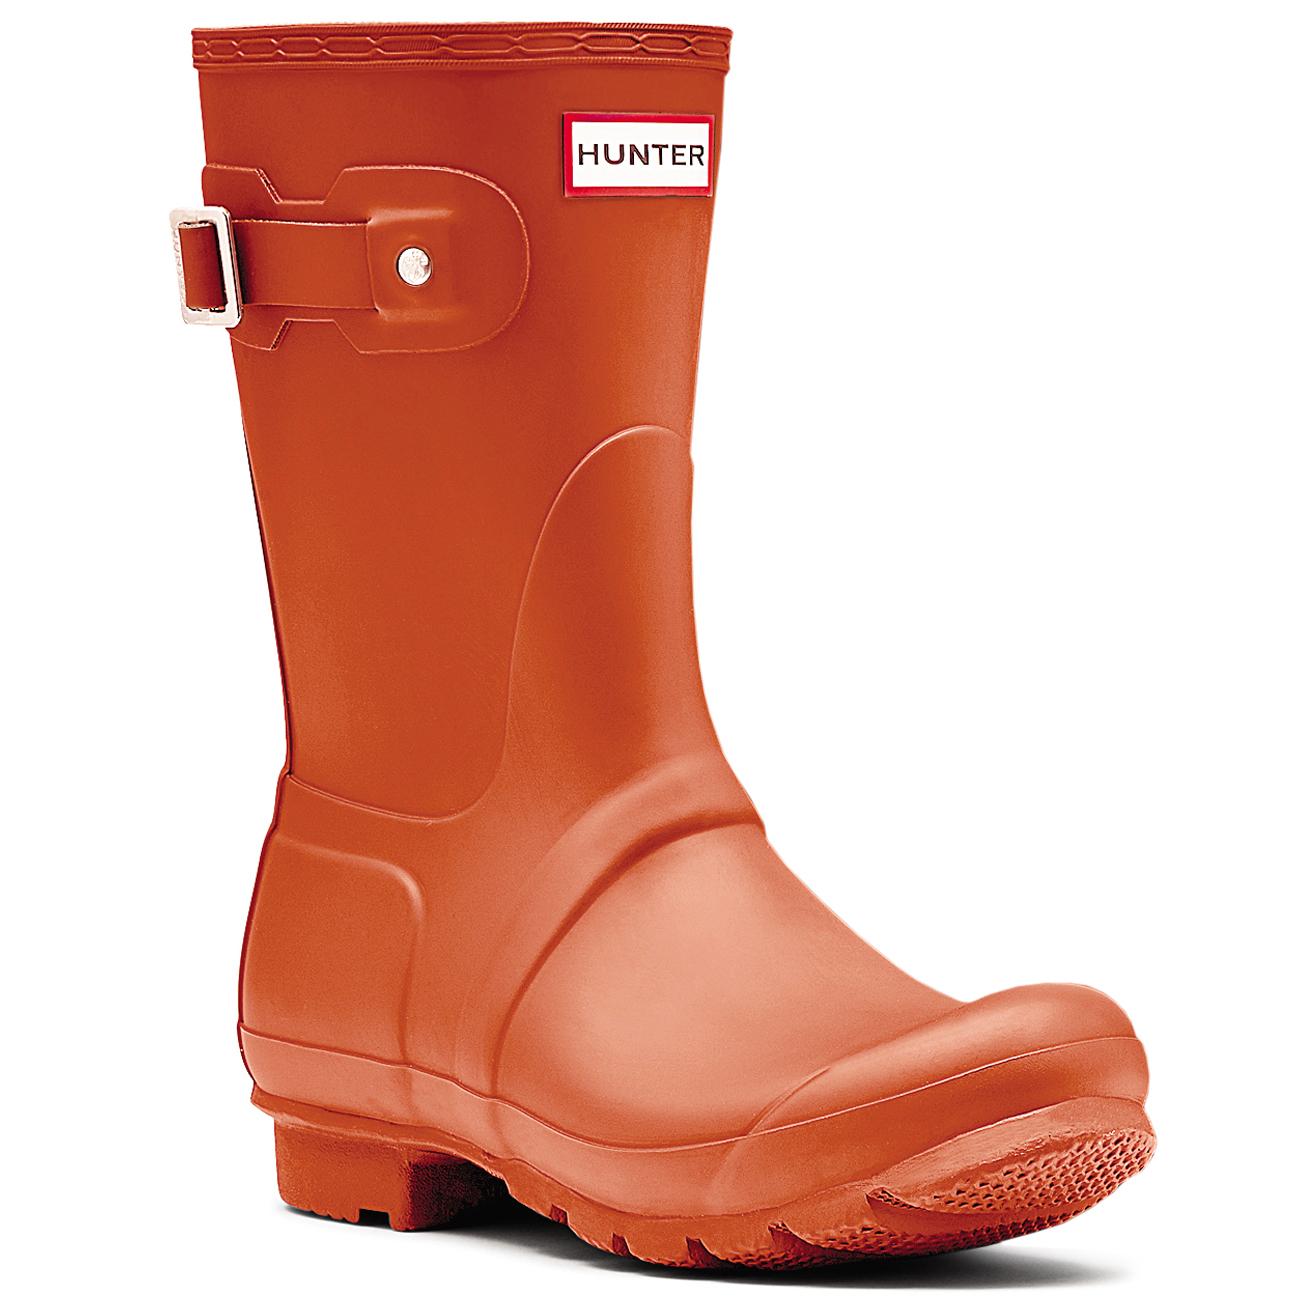 Damenschuhe Hunter Original Short Short Original Winter Rain Snow Wellies Waterproof Stiefel UK 3-9 70bbcb